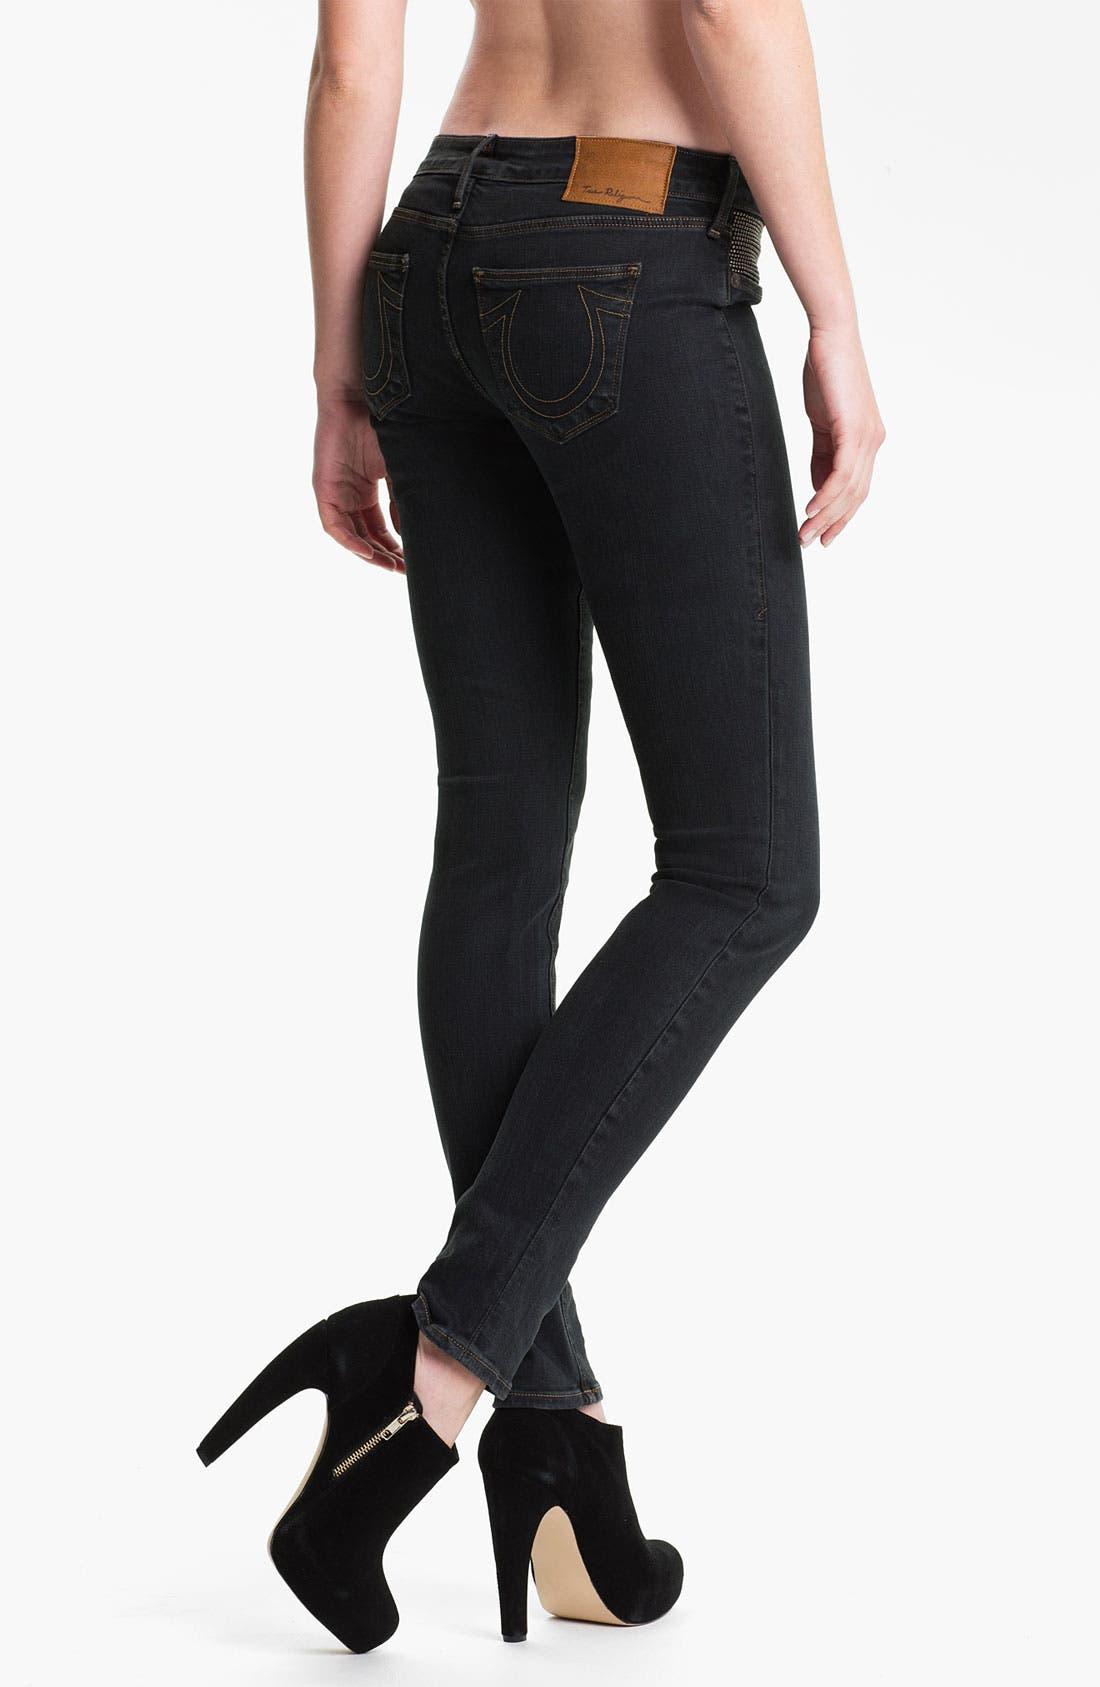 Alternate Image 2  - True Religion Brand Jeans 'Shannon' Studded Pocket Skinny Jeans (Black Stone)